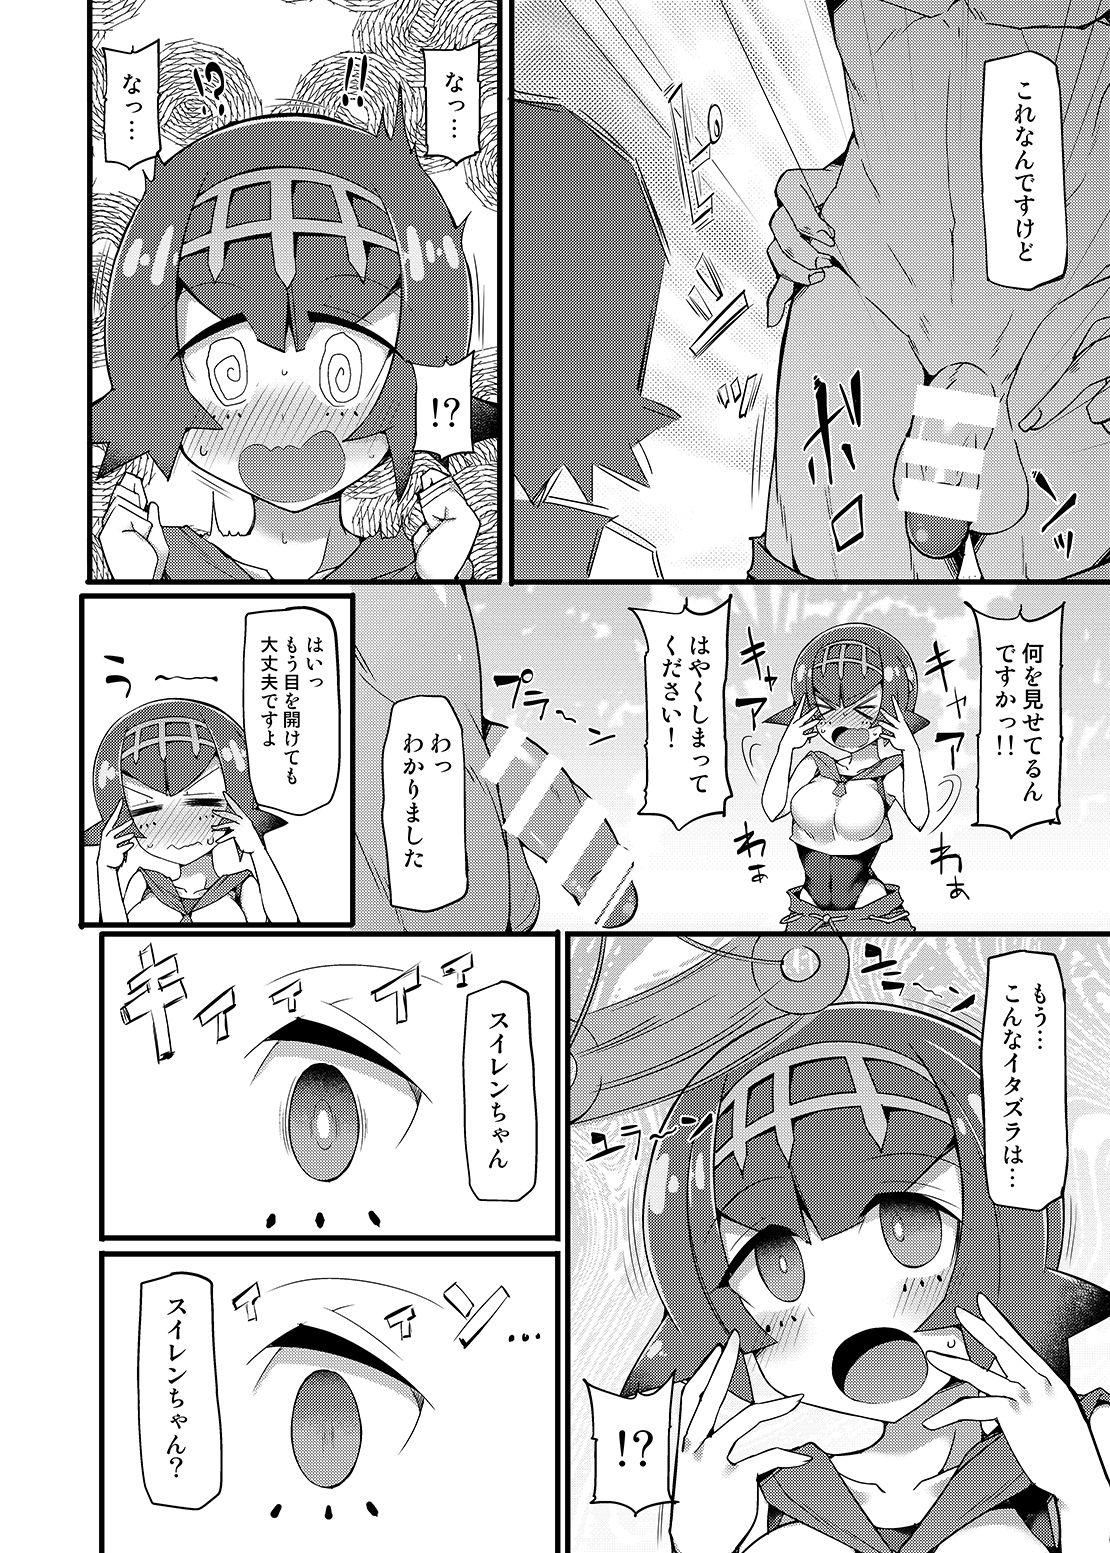 [Stapspats (Hisui)] Stapspats [Pocket Monster Saimin Series Soushuuhen] 1 Collective Hypnosis (Pokémon) [Digital] 96